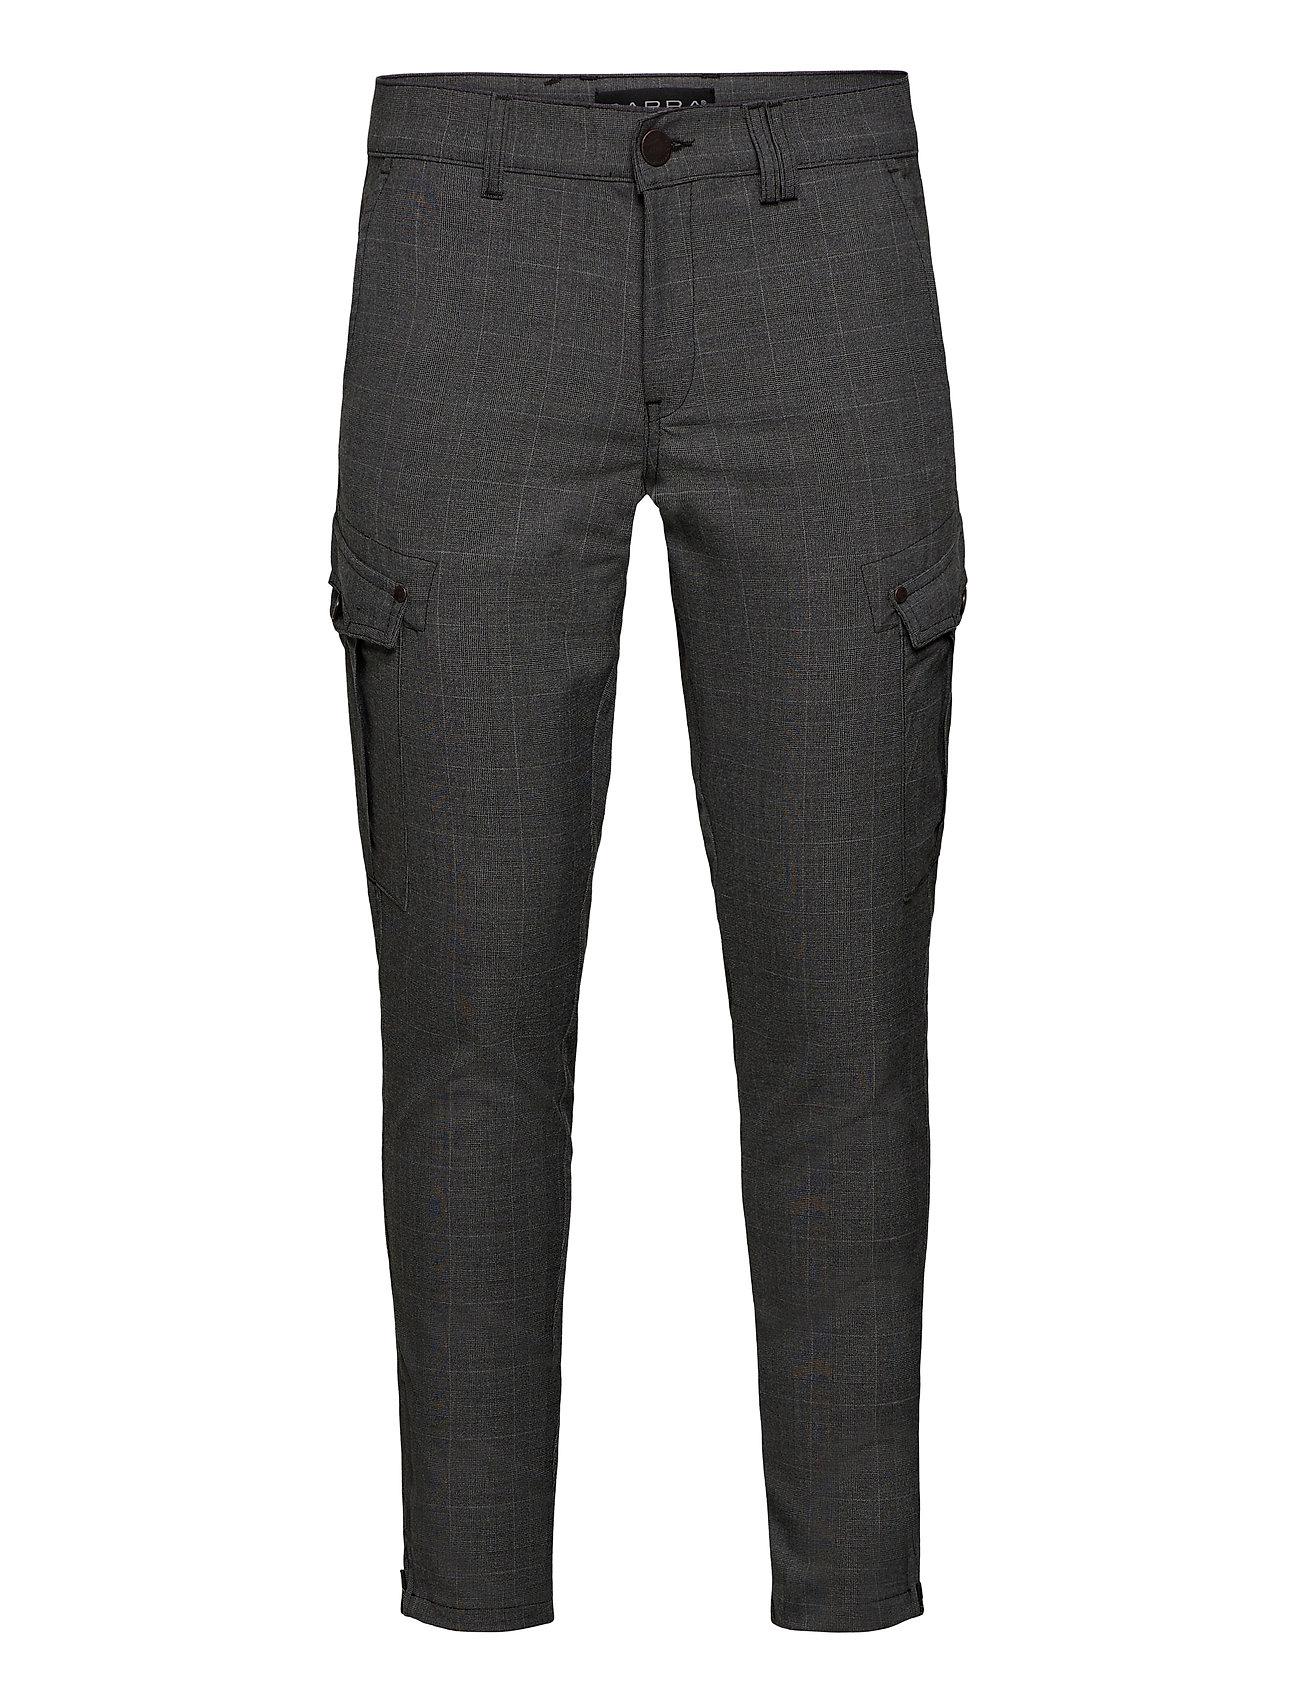 Image of Pisa Cargo Grey Check Pant Trousers Cargo Pants Grå Gabba (3456993253)